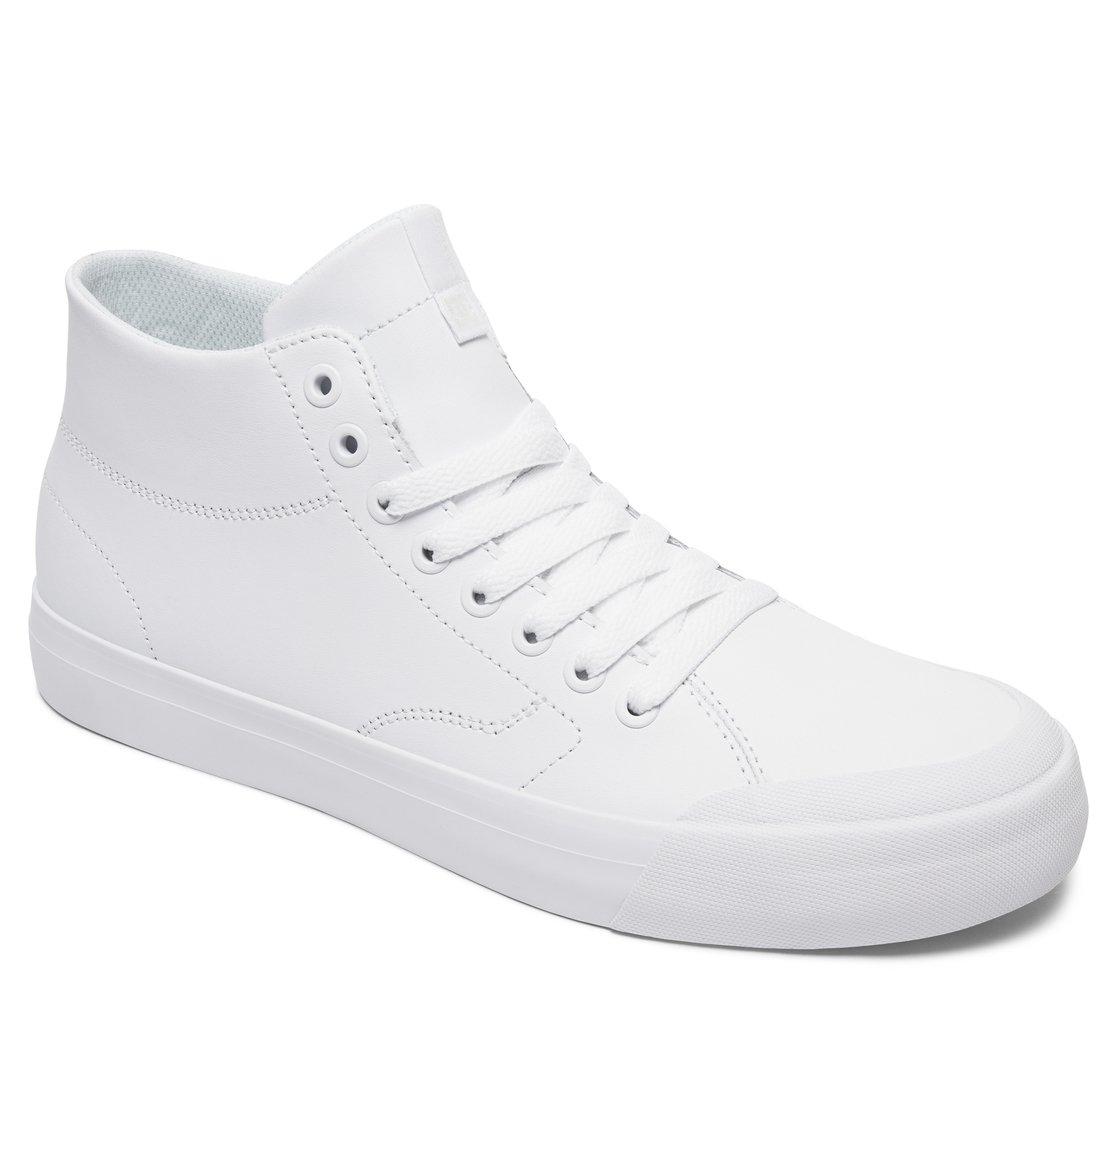 Chaussures Homme DC EVAN SMITH HI white 20XAdGB4